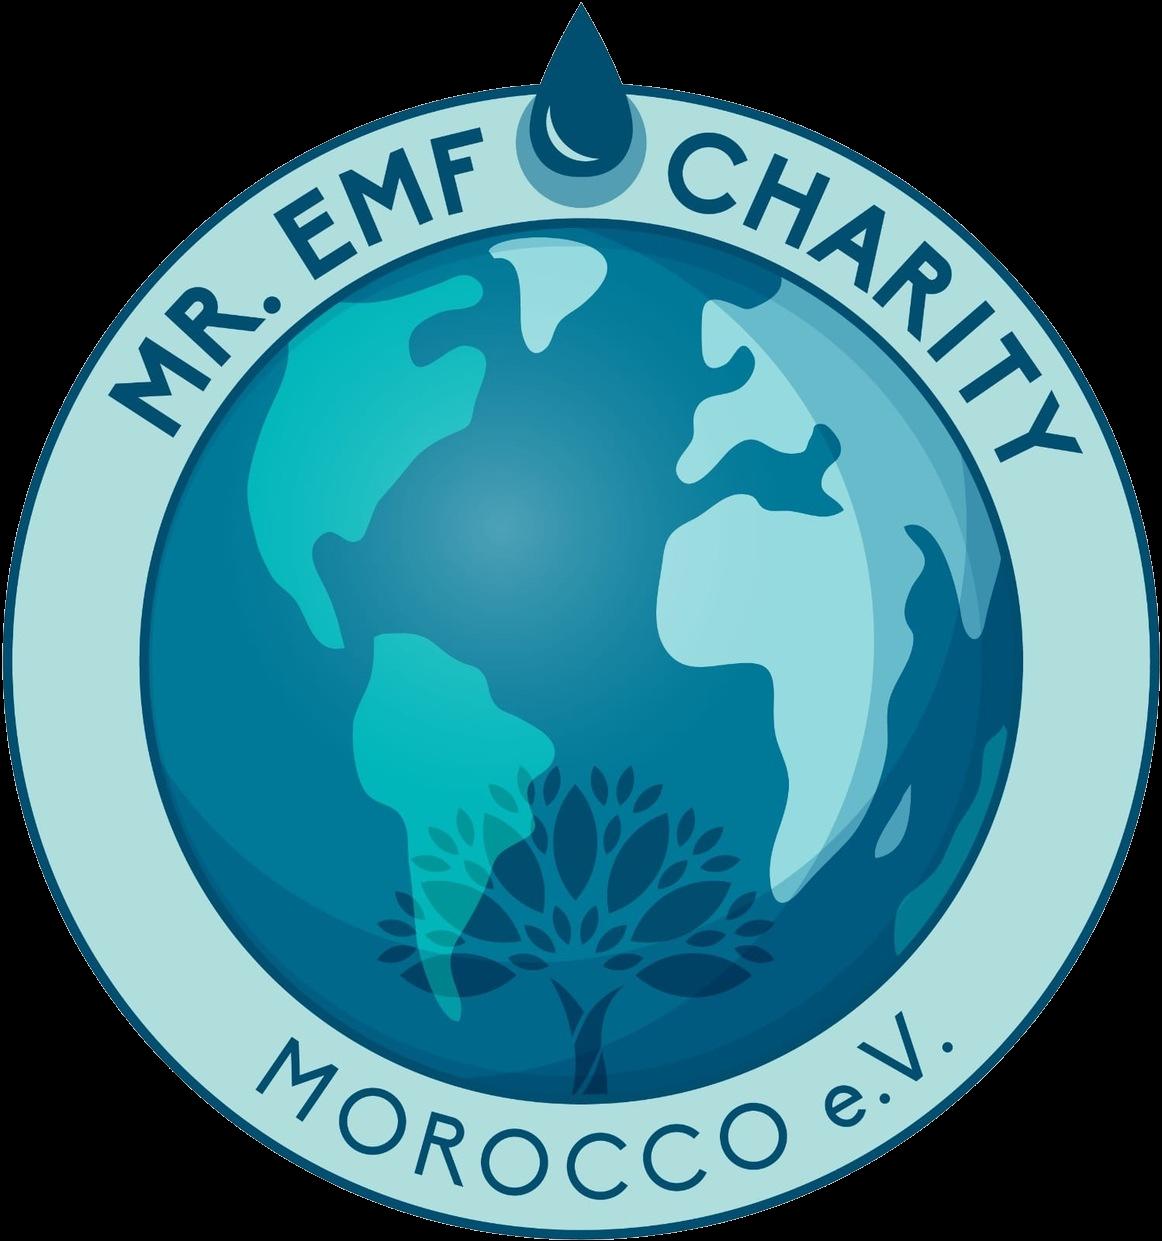 Mr Emf Charity logo